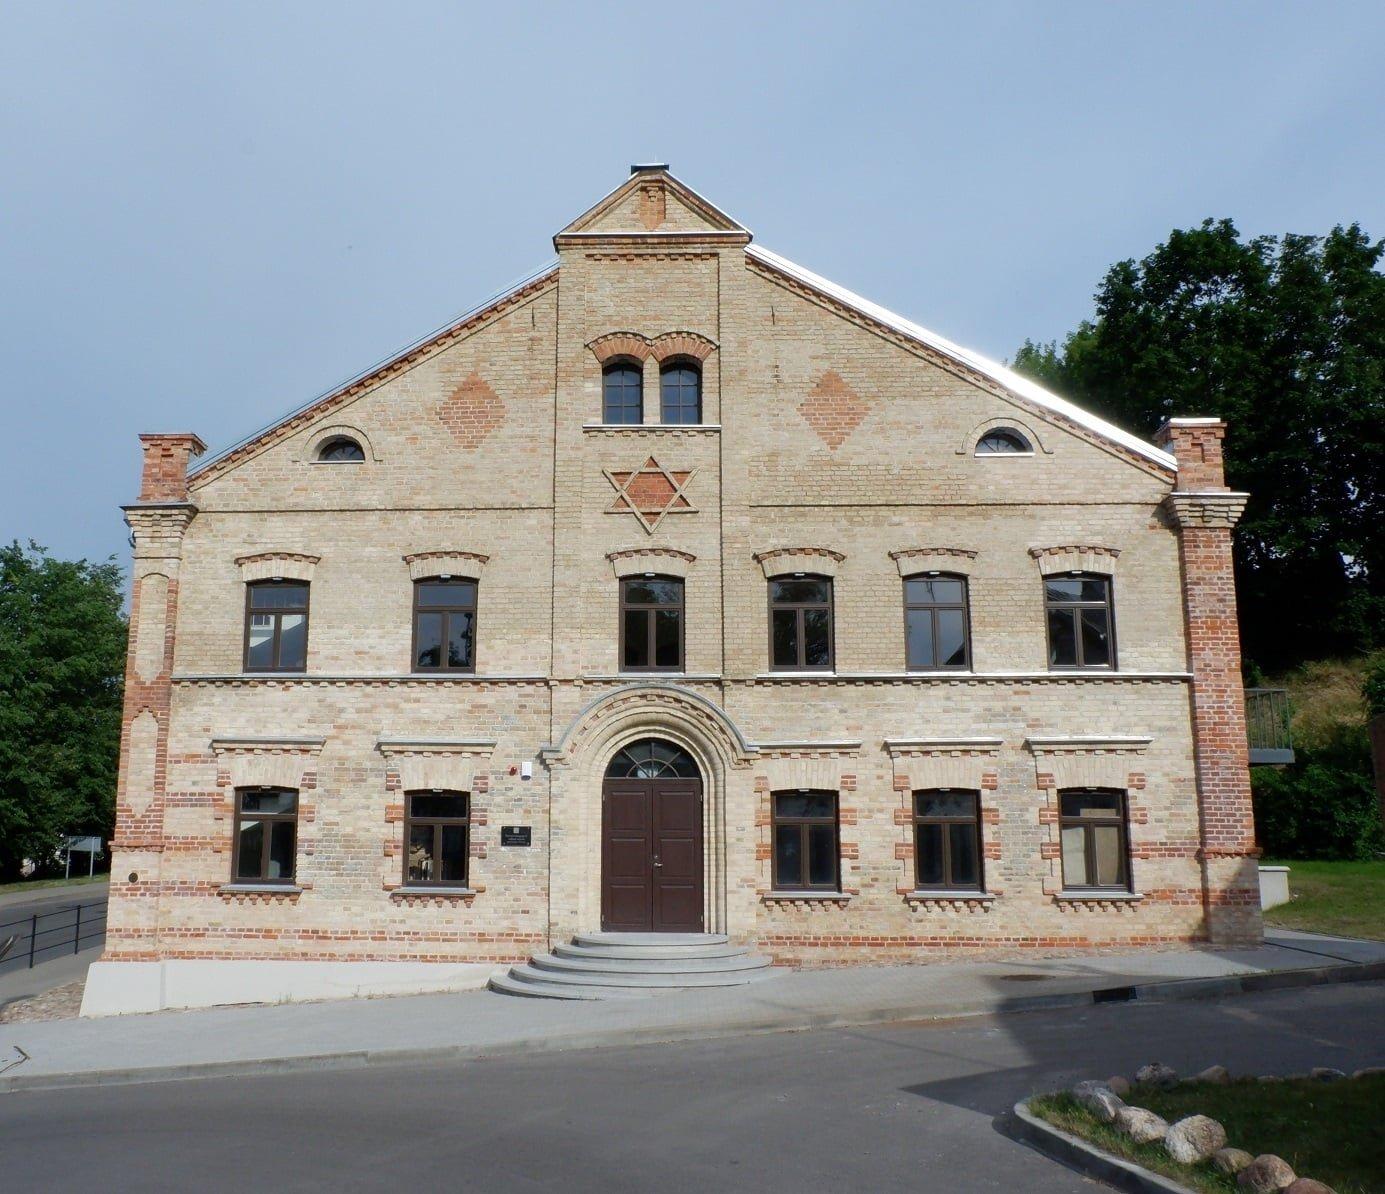 Buvusi Alytaus sinagoga atveria duris